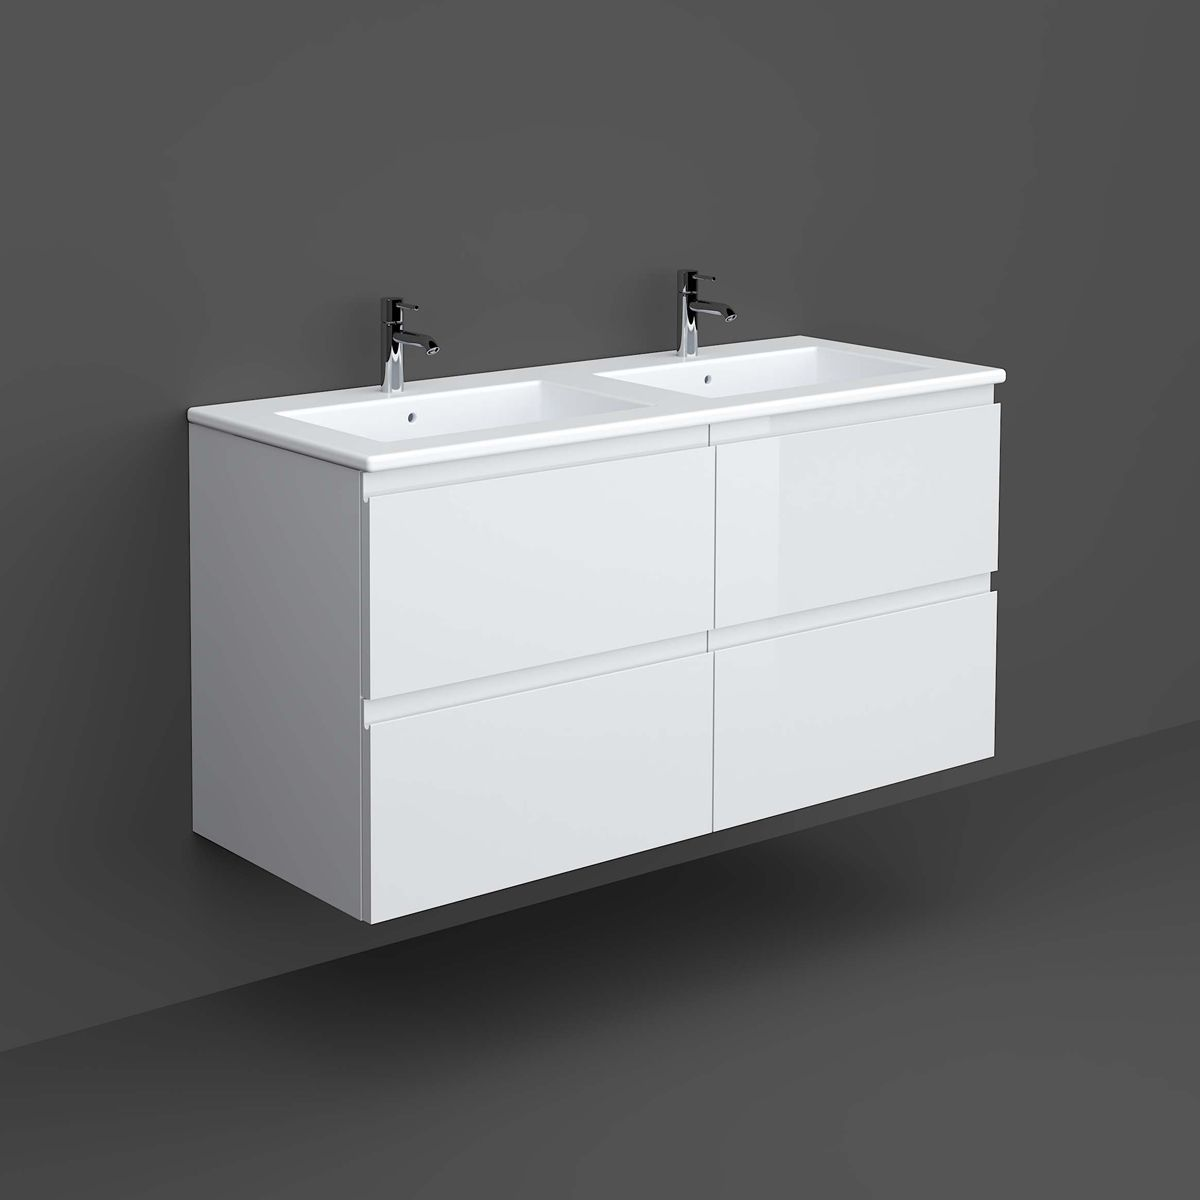 Rak Joy Pure White Wall Hung Vanity Unit 1200mm